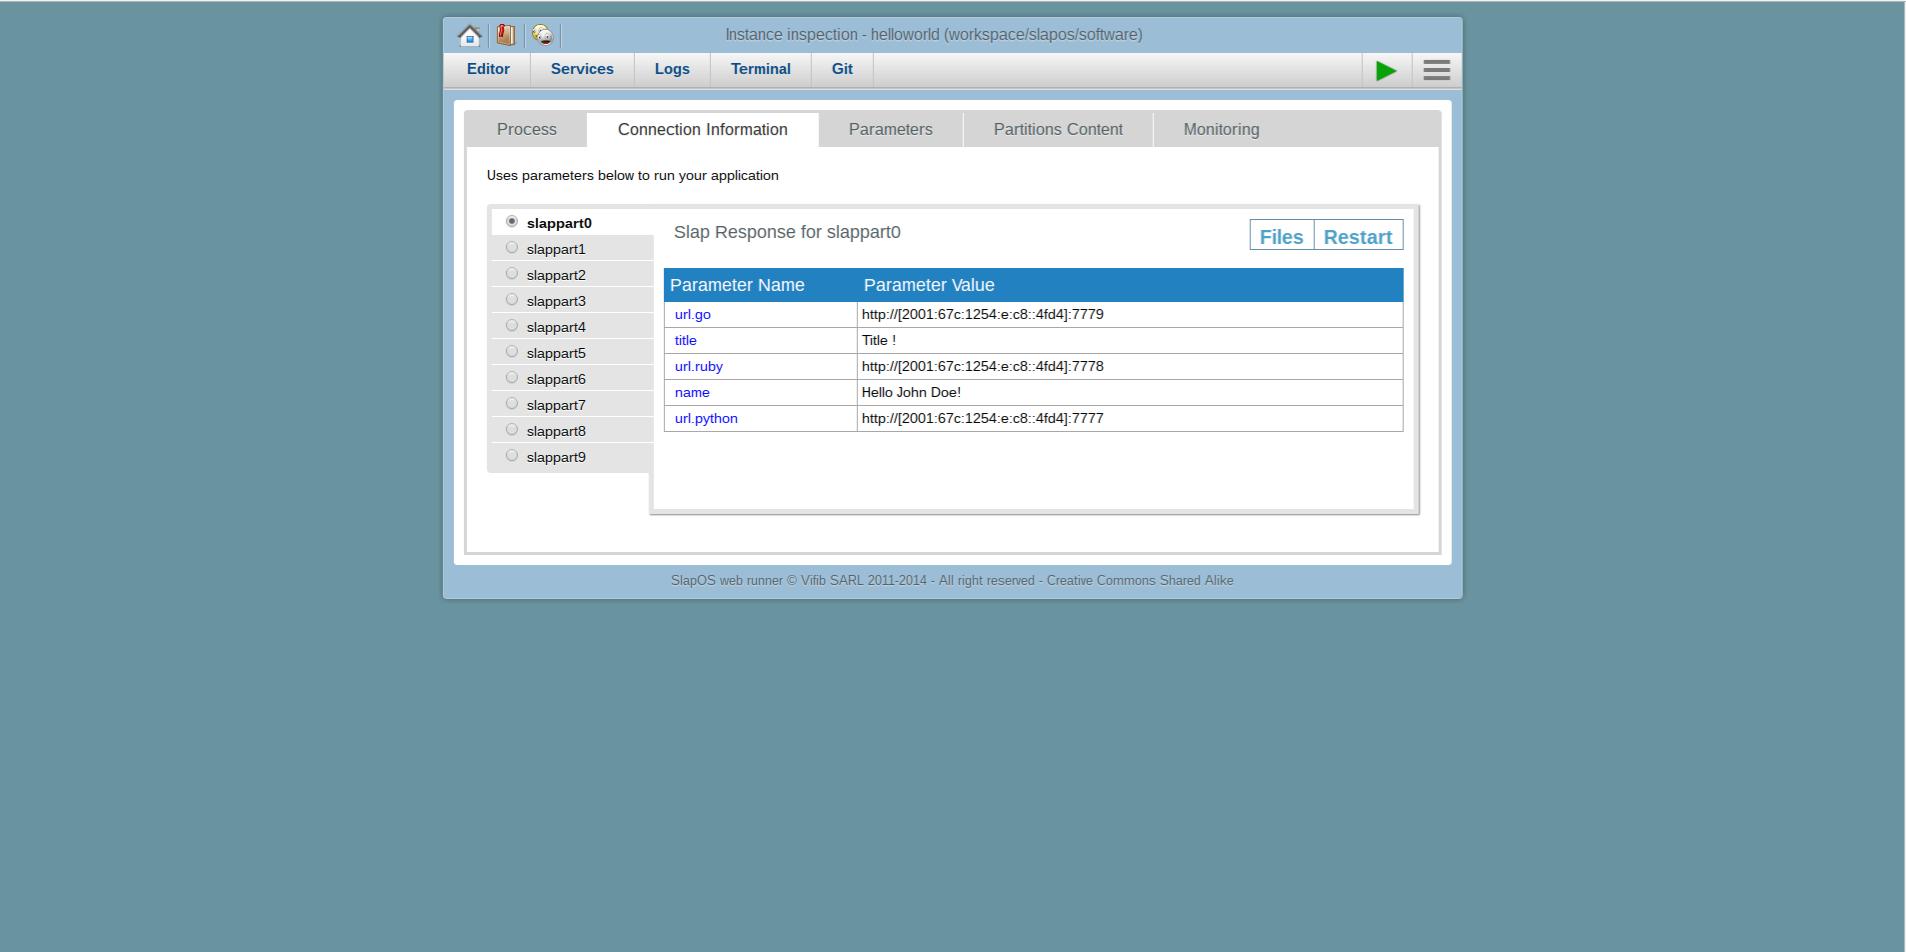 Extending Software Release - Webrunner Interface - Software Rebuild Completed